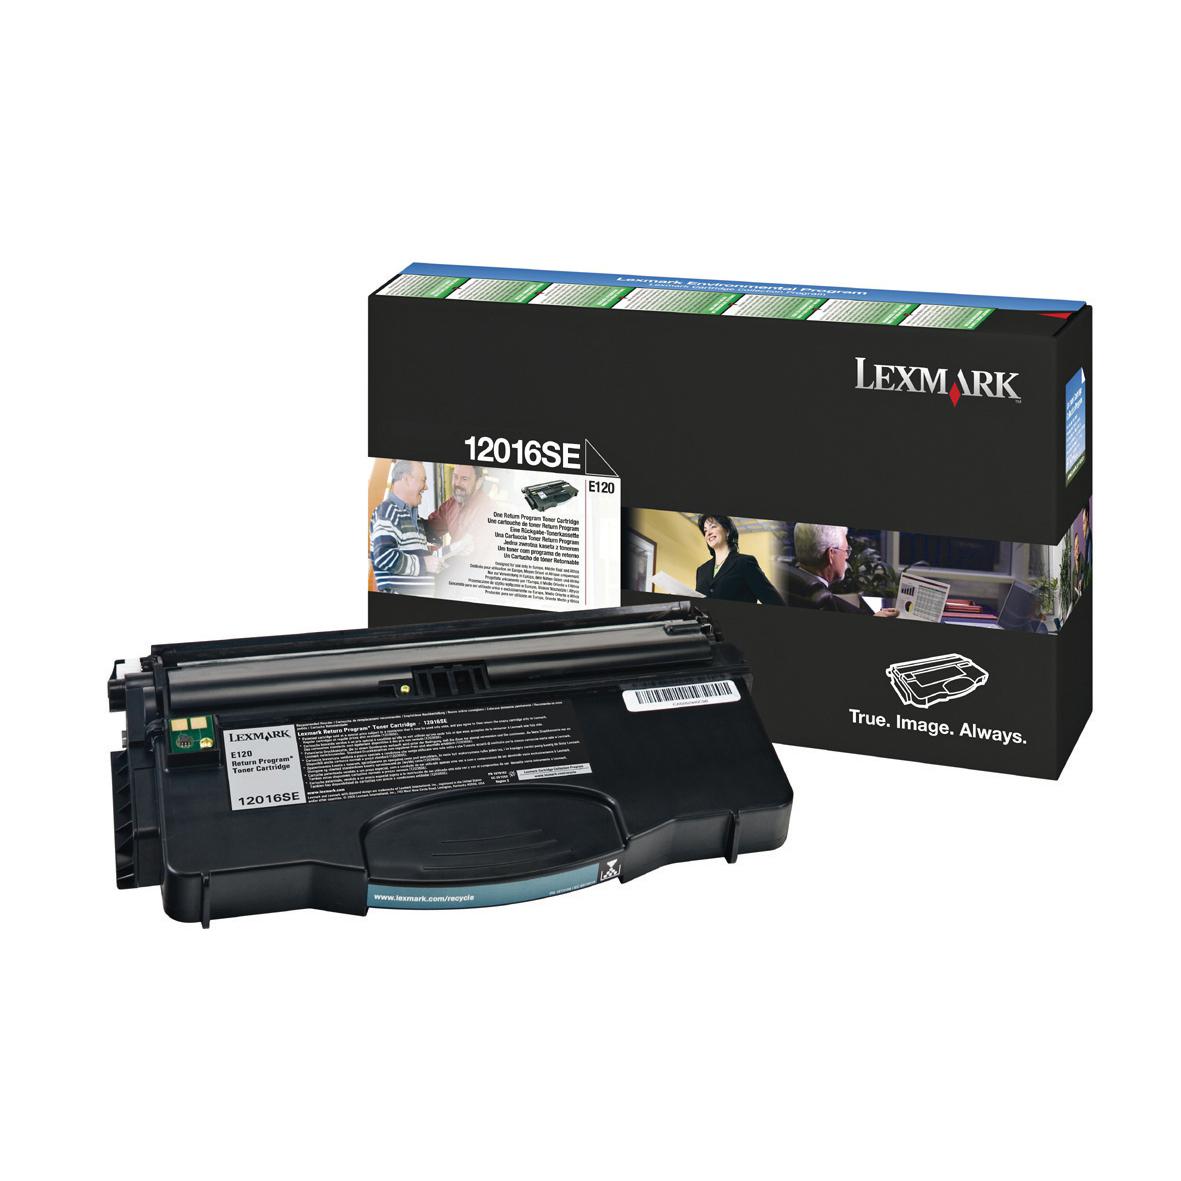 Lexmark E120 Laser Toner Cartridge Return Programme Page Life 2000pp Black Ref 12016SE